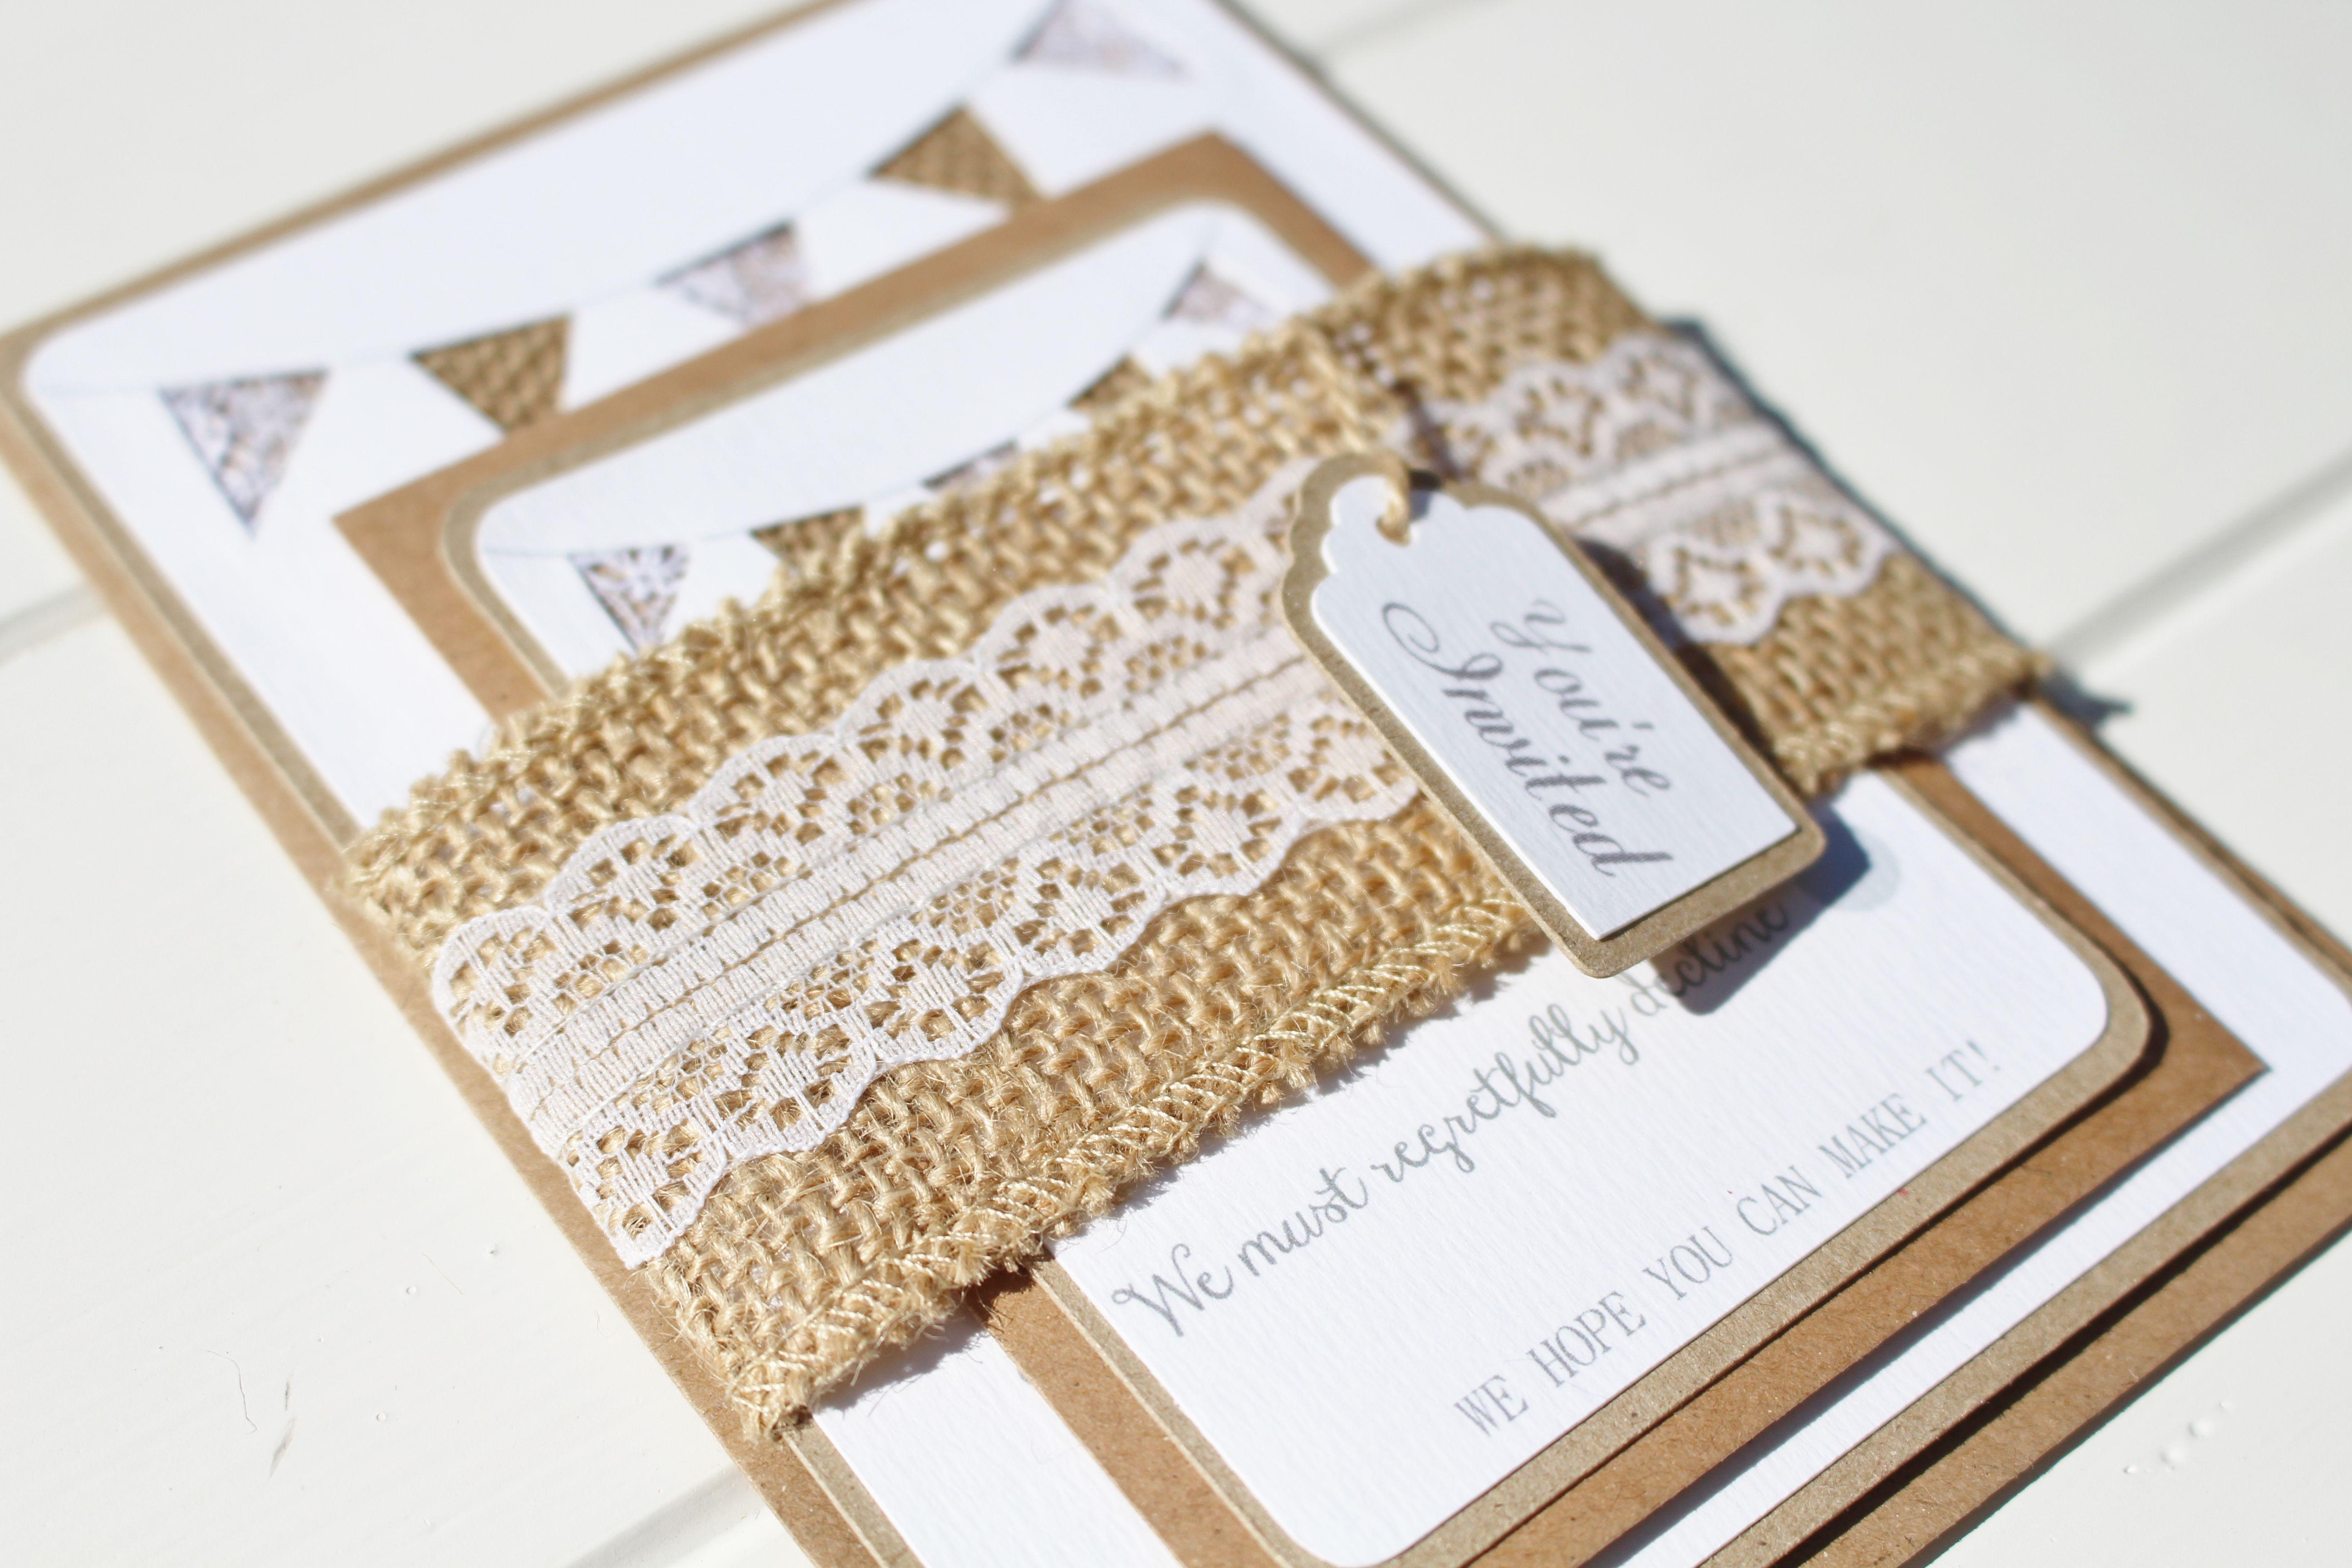 Rustic lace and hessian bunting wedding invitation | Etsy Wedding ...